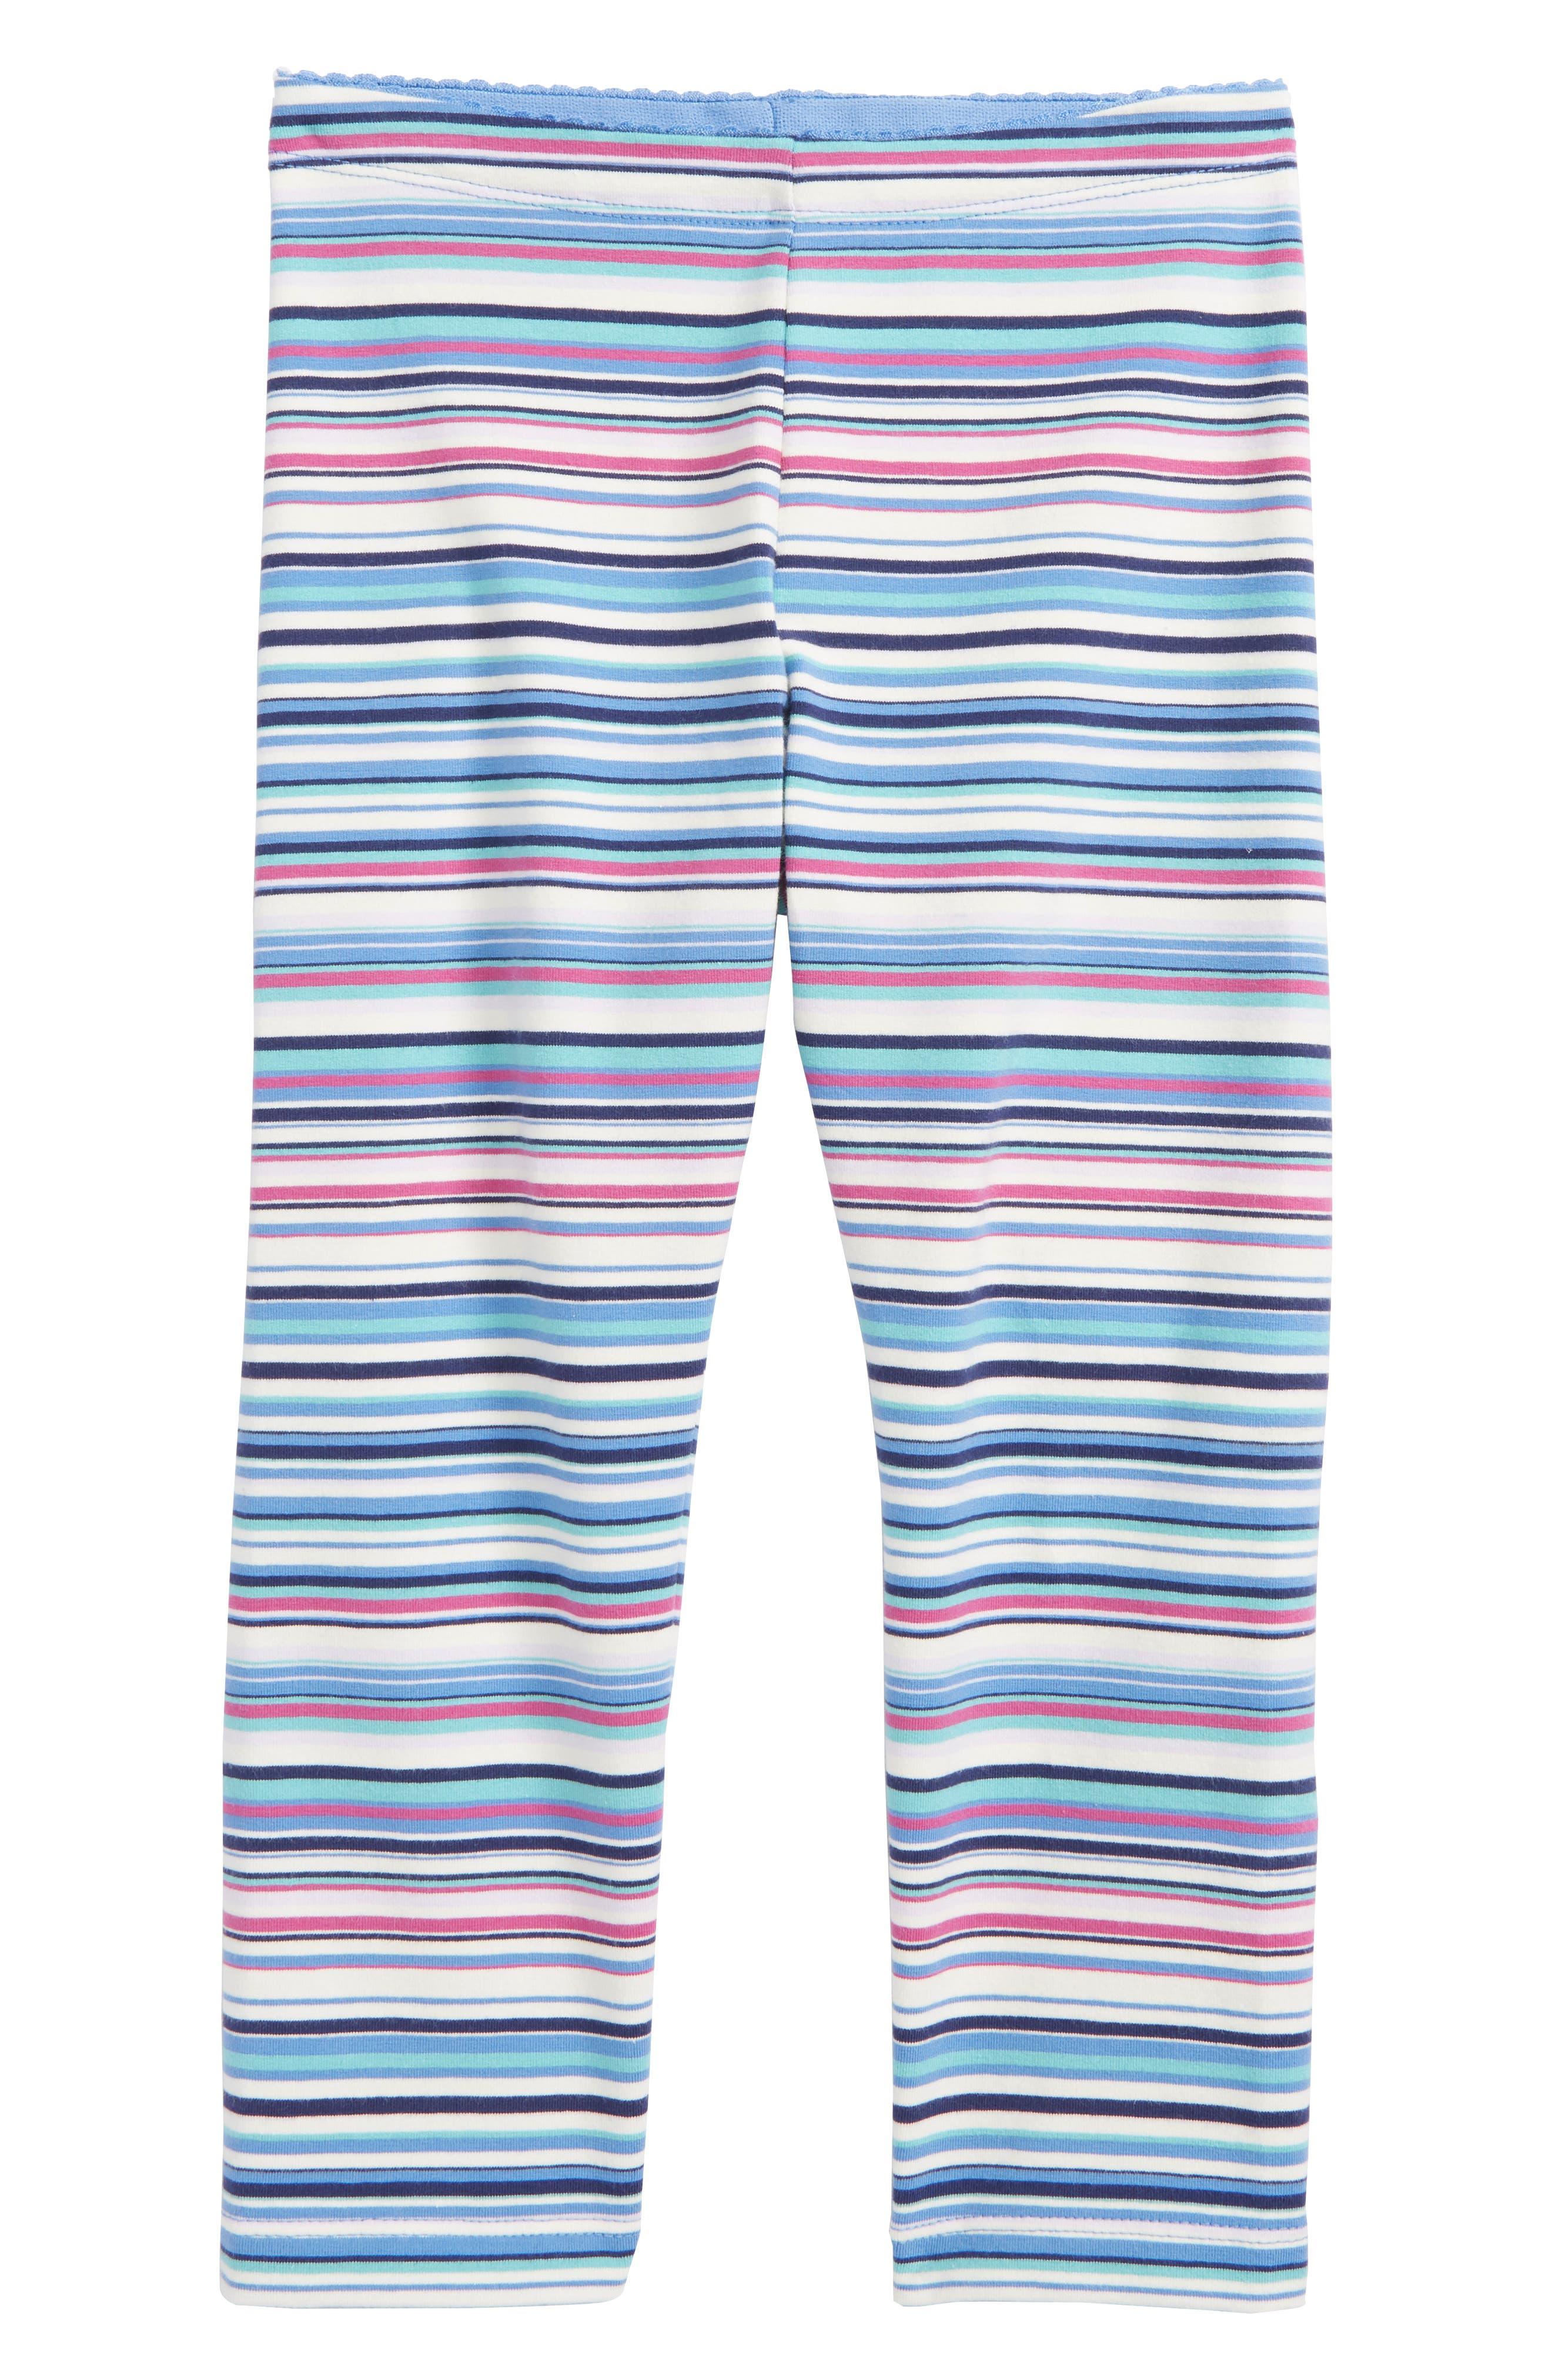 Multicolor Stripe Capri Leggings,                             Main thumbnail 1, color,                             495